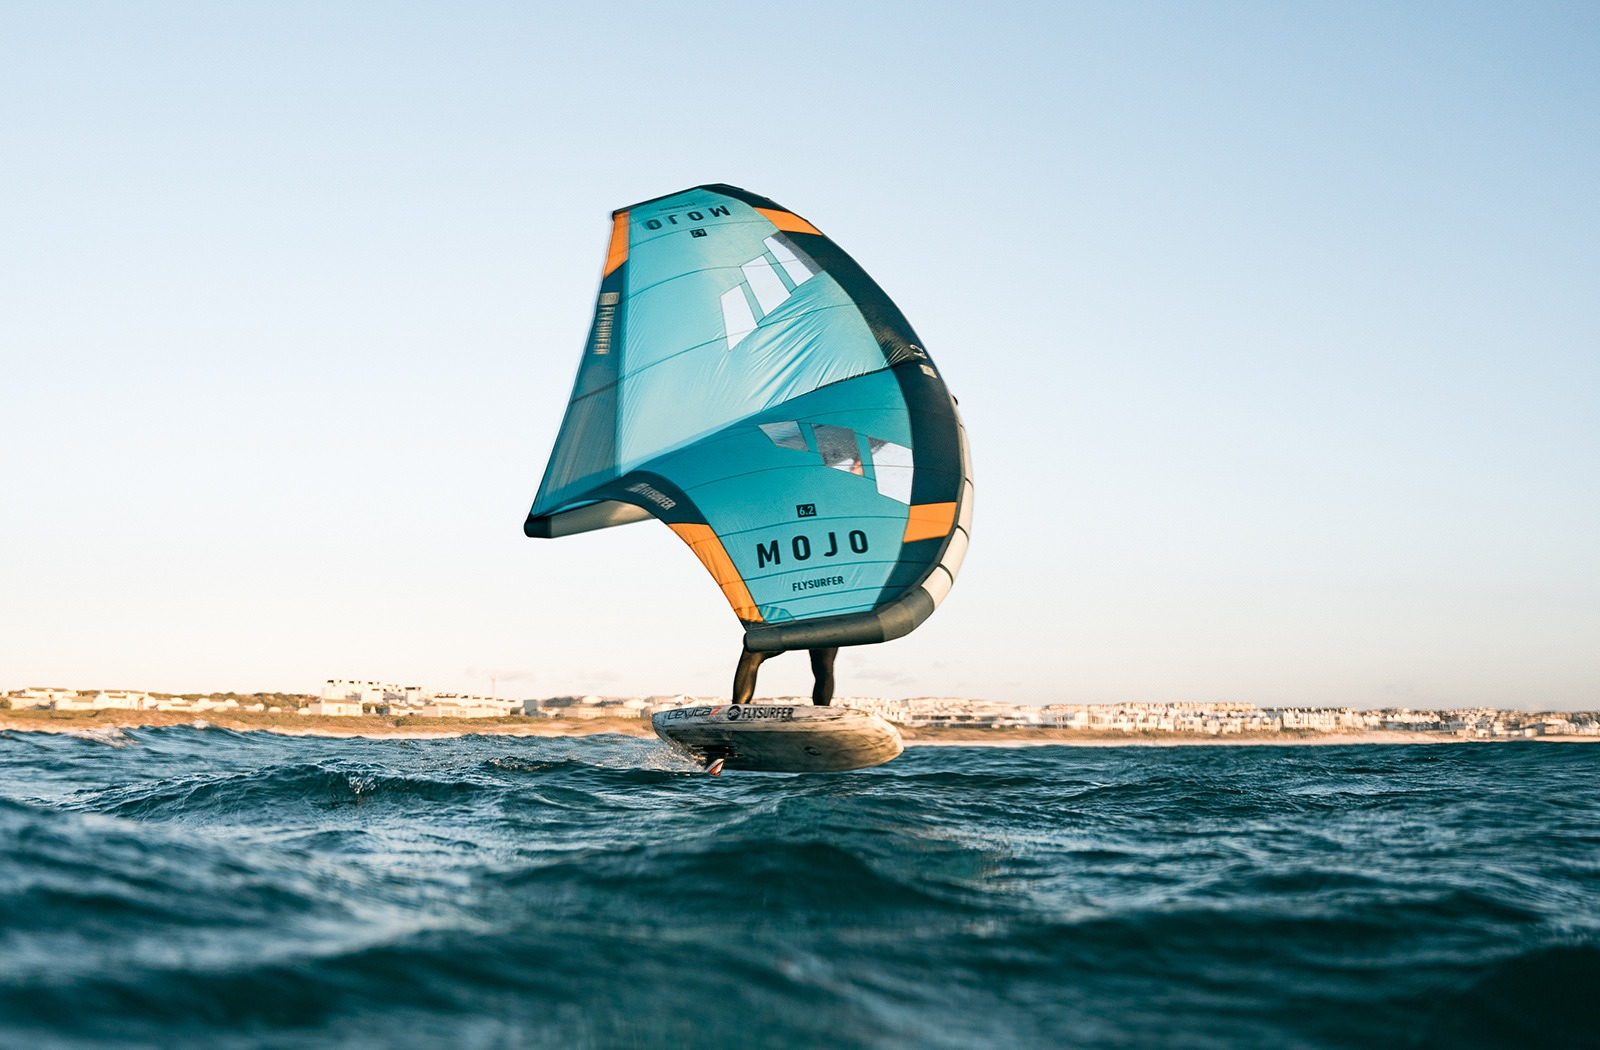 Flysurfer-MOJO-07-by-MiriamJoanna